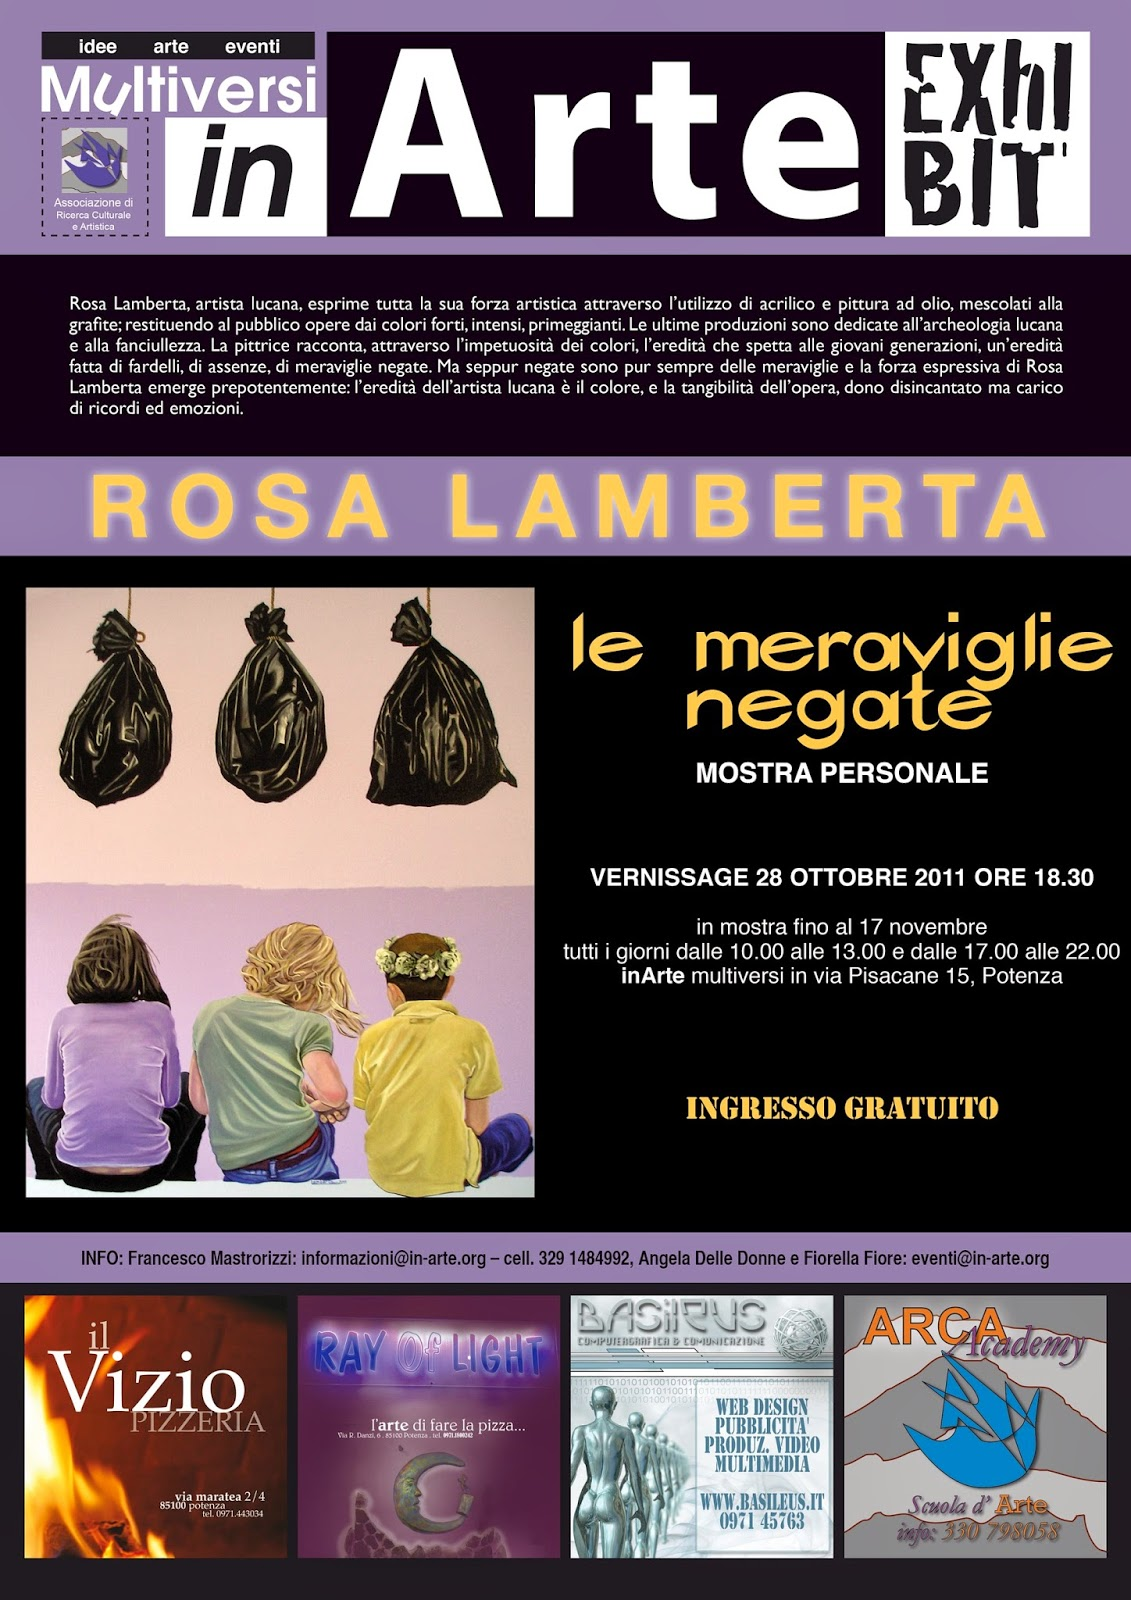 http://inarte-blog.blogspot.it/2011/10/rosa-lamberta-le-meraviglie-negate.html